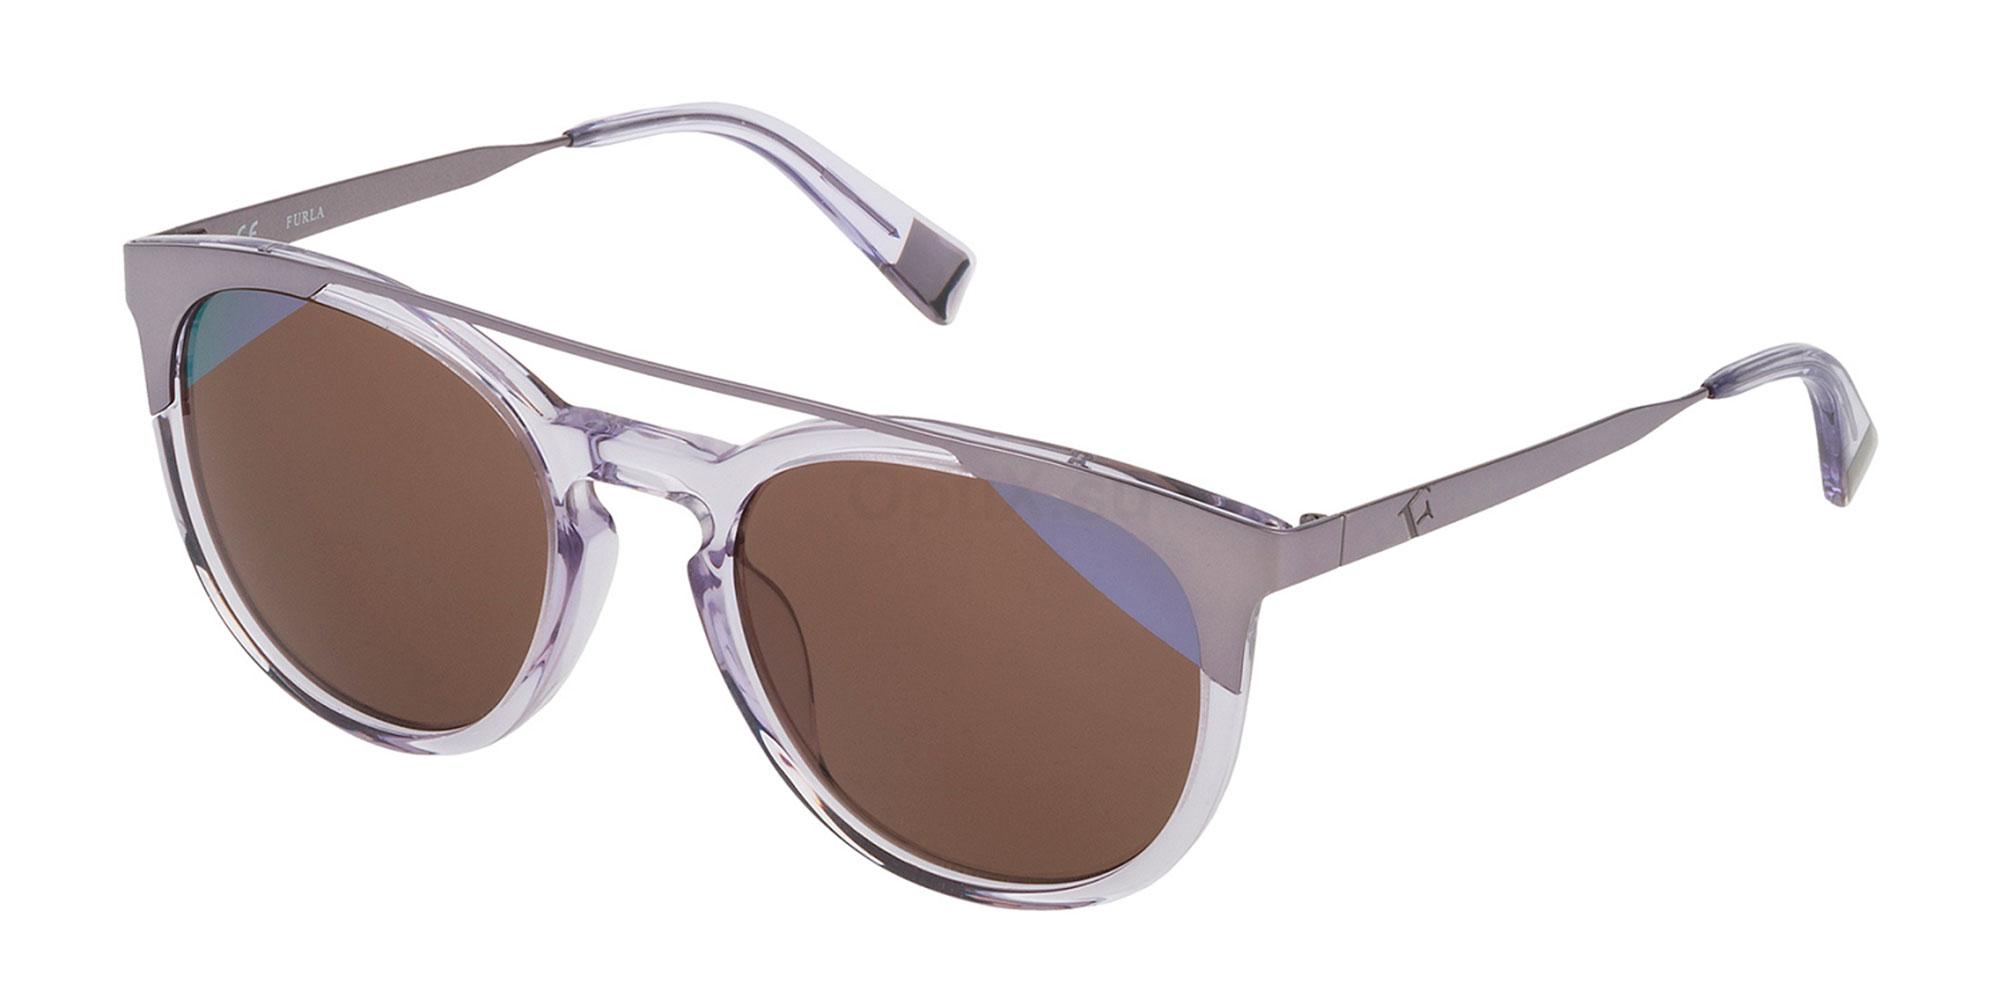 6PFV SFU244 Sunglasses, Furla